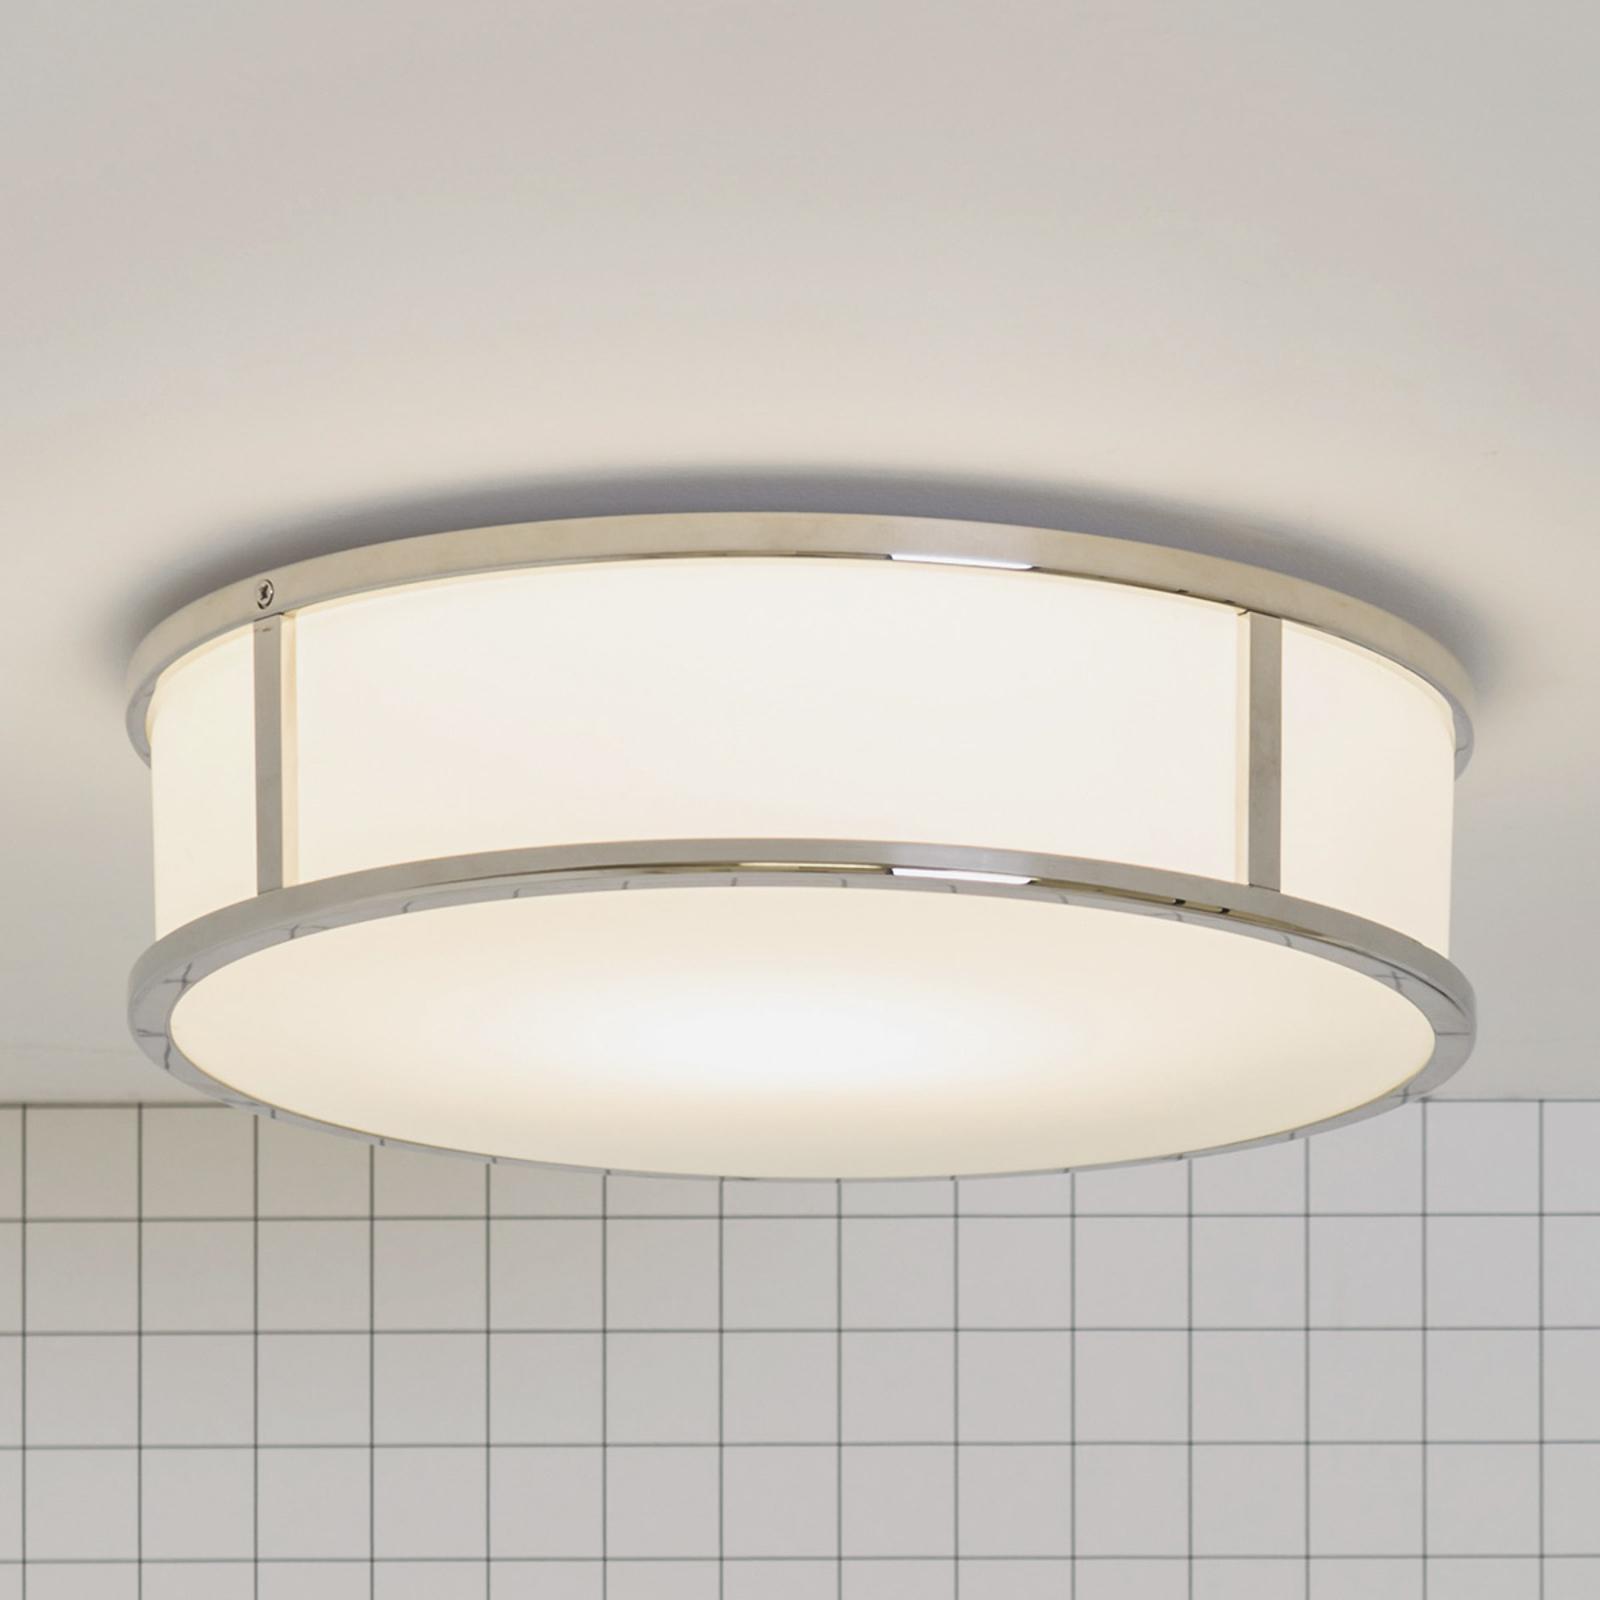 Astro Mashiko Round stropné svietidlo Ø 30cm chróm_1020466_1